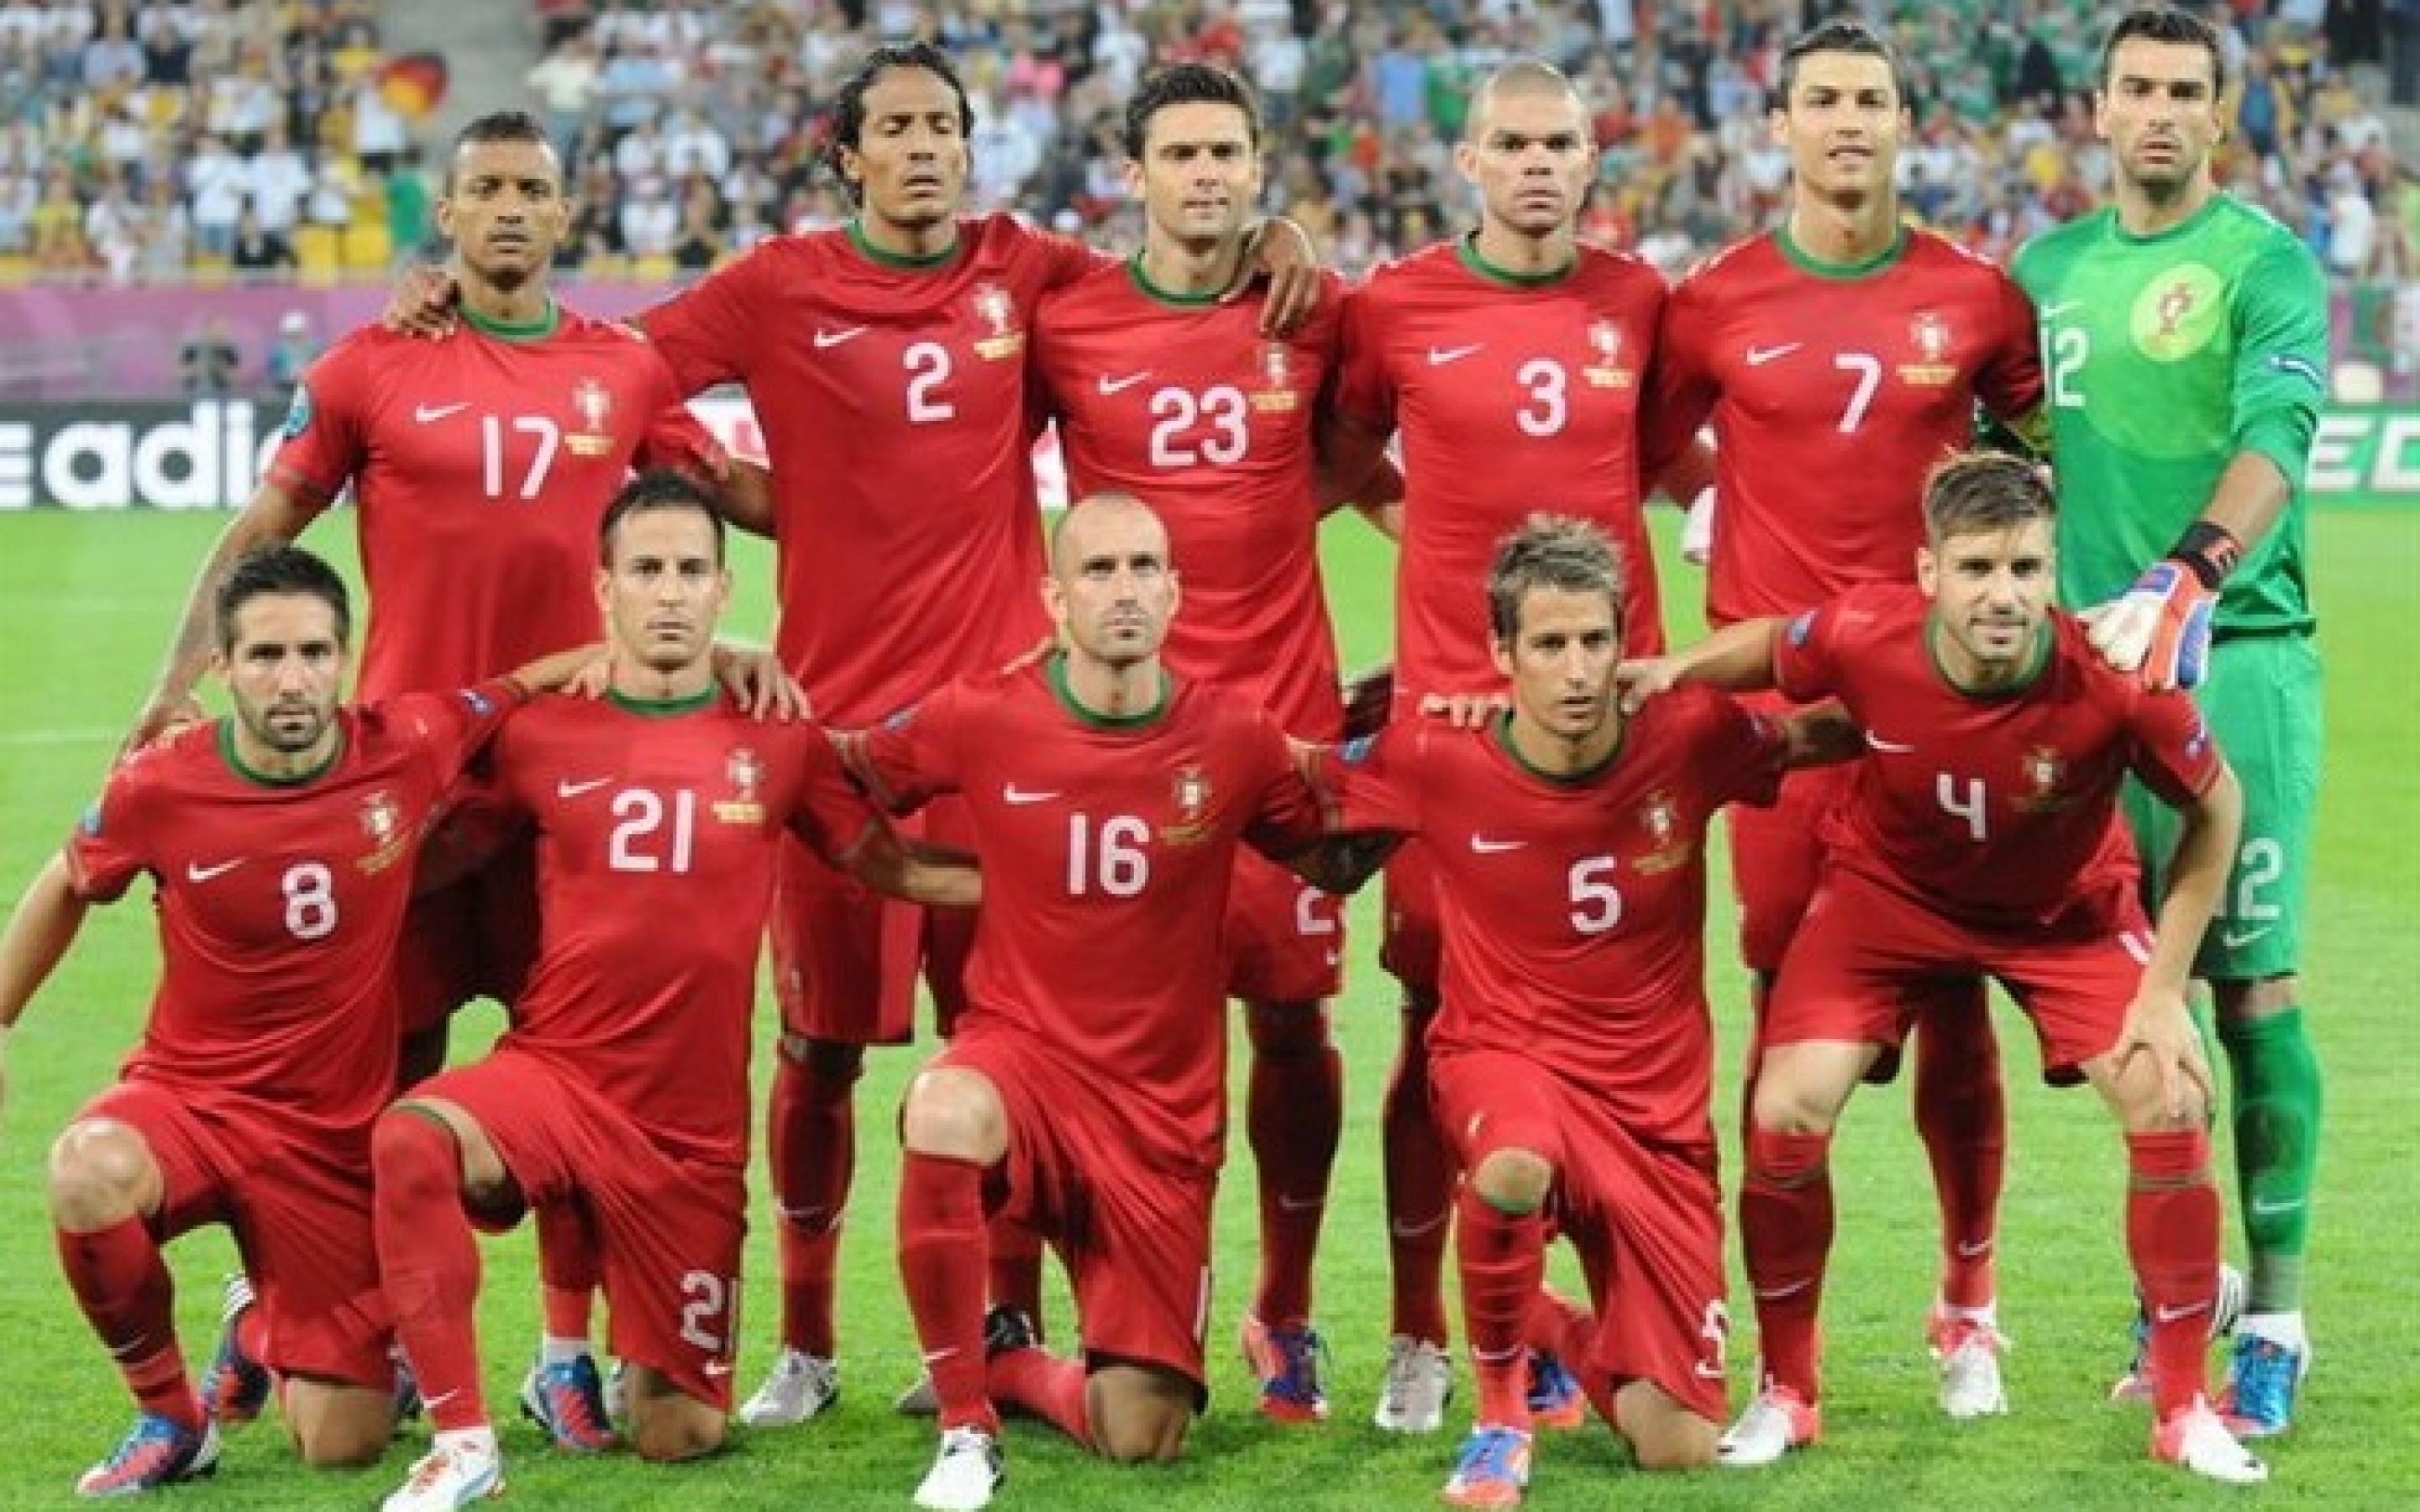 Portugal 2014 Brazil World Cup